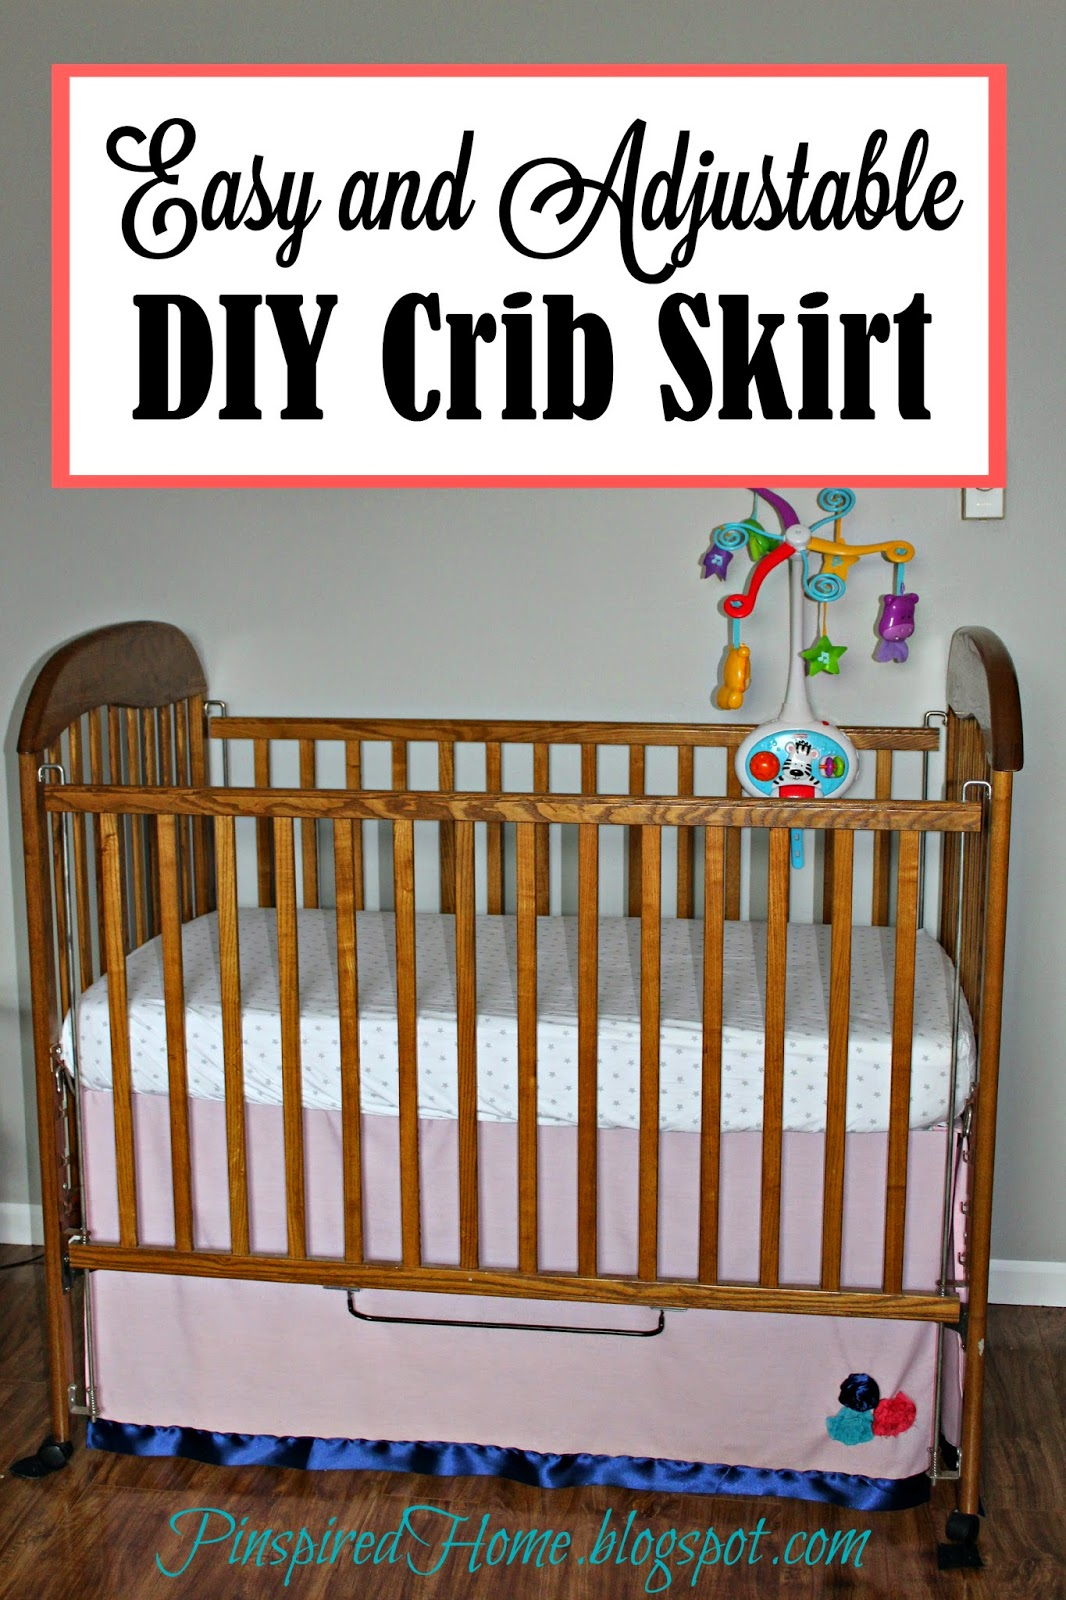 Pinspired Home Easy And Adjustable Diy Crib Skirt